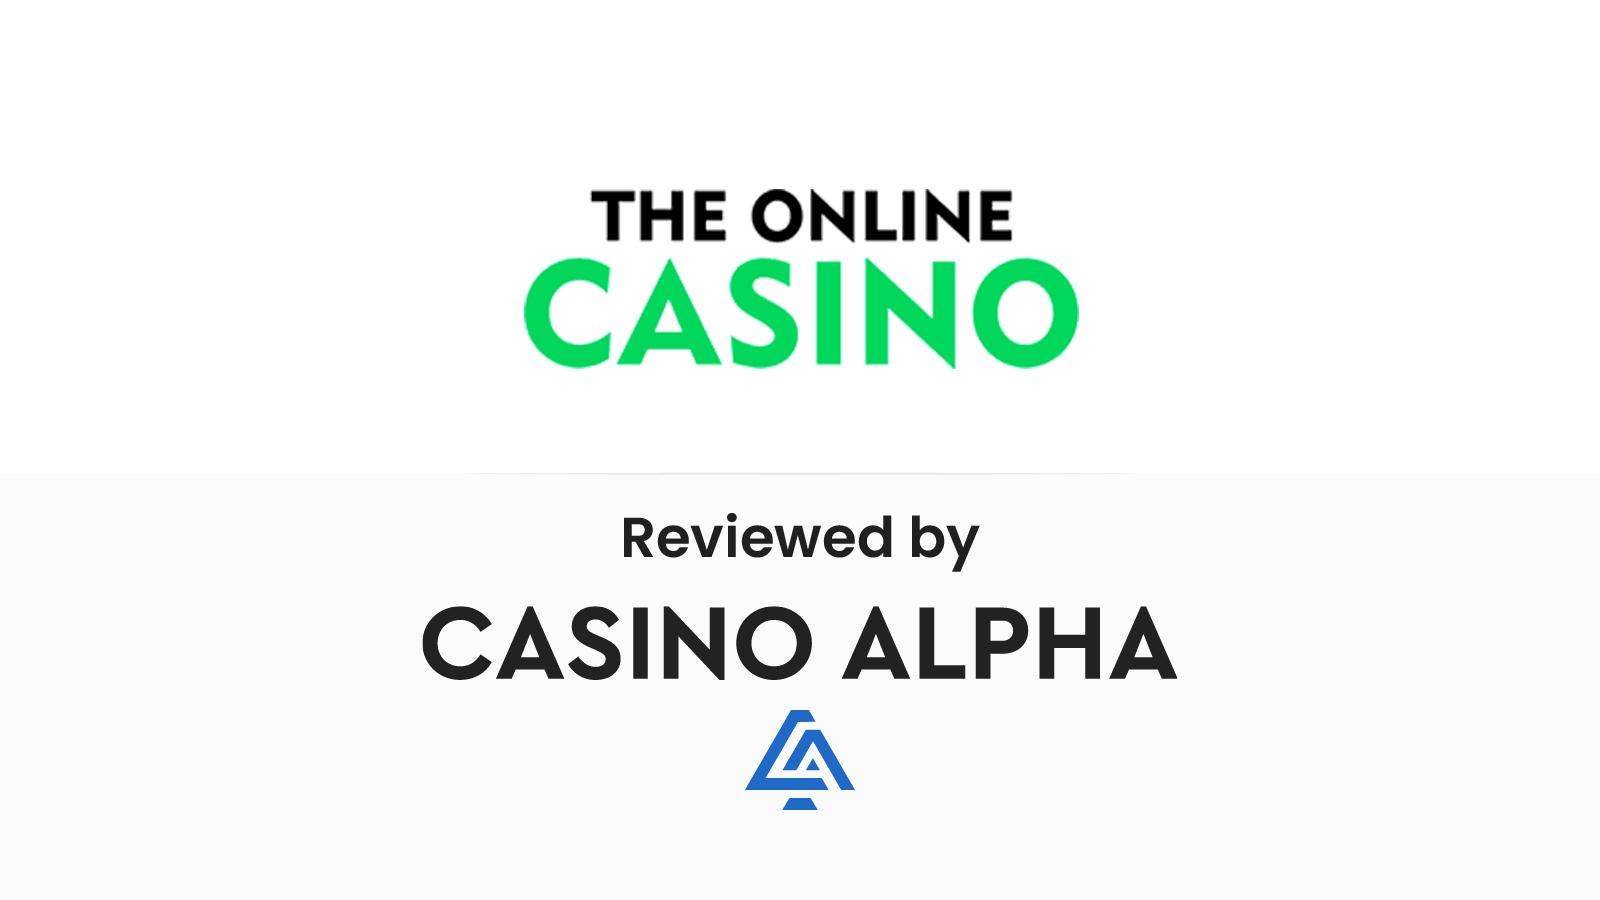 TheOnlineCasino Review & Bonuses